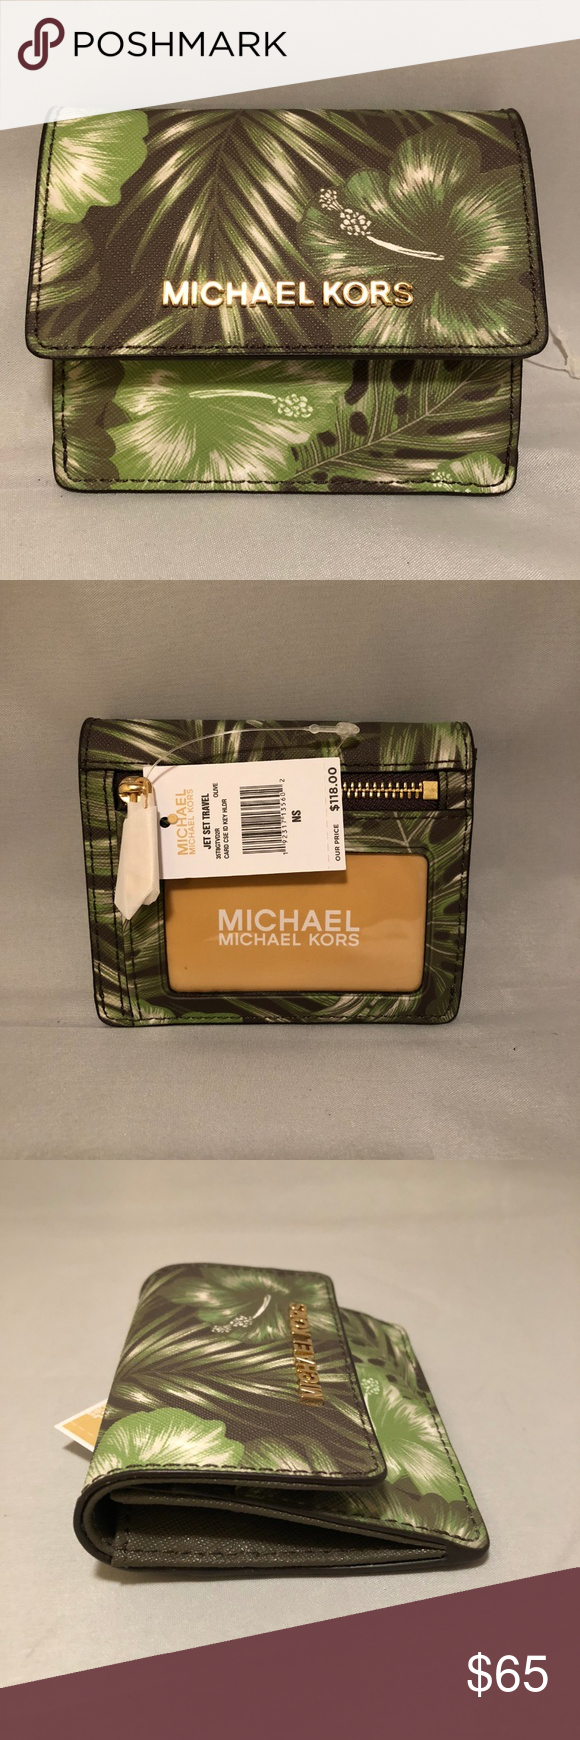 2f424823eb8e87 Michael Kors Jet Set Card Case ID Key Holder Olive Palm Leaf Print Saffiano  leather with